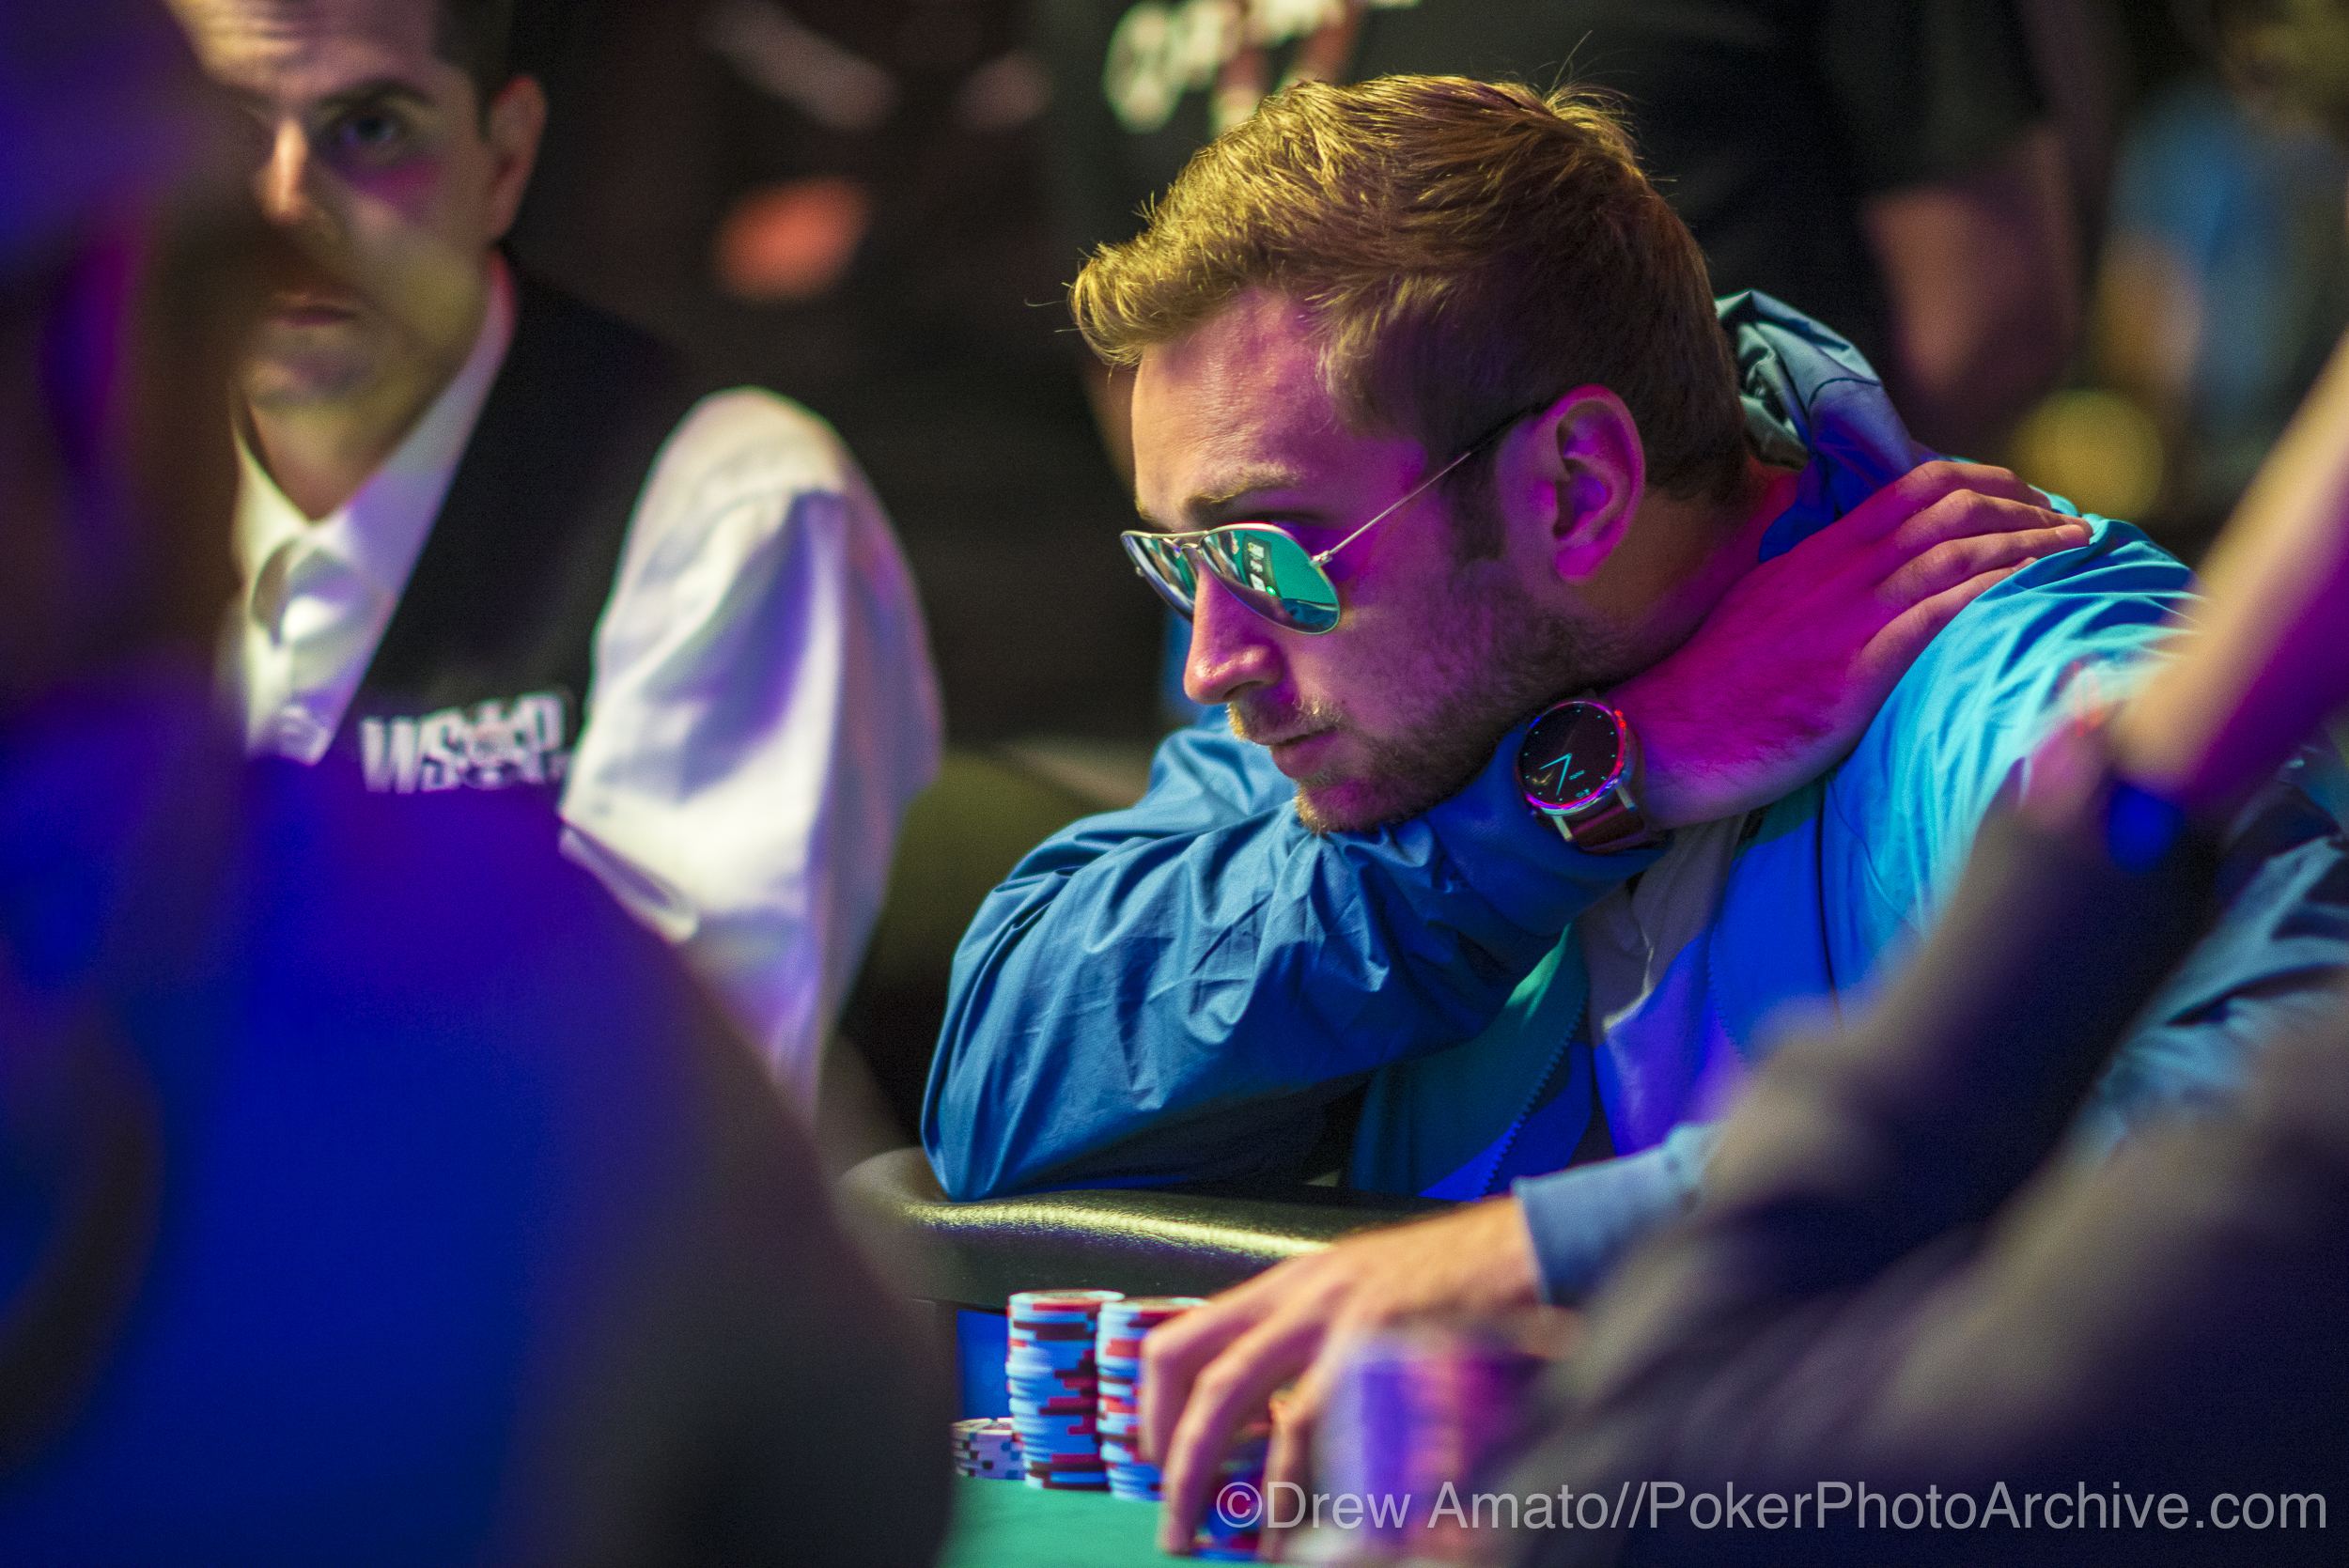 Connor Drinan_2017 WSOP_EV010_Day 3_Amato_DA66972.jpg